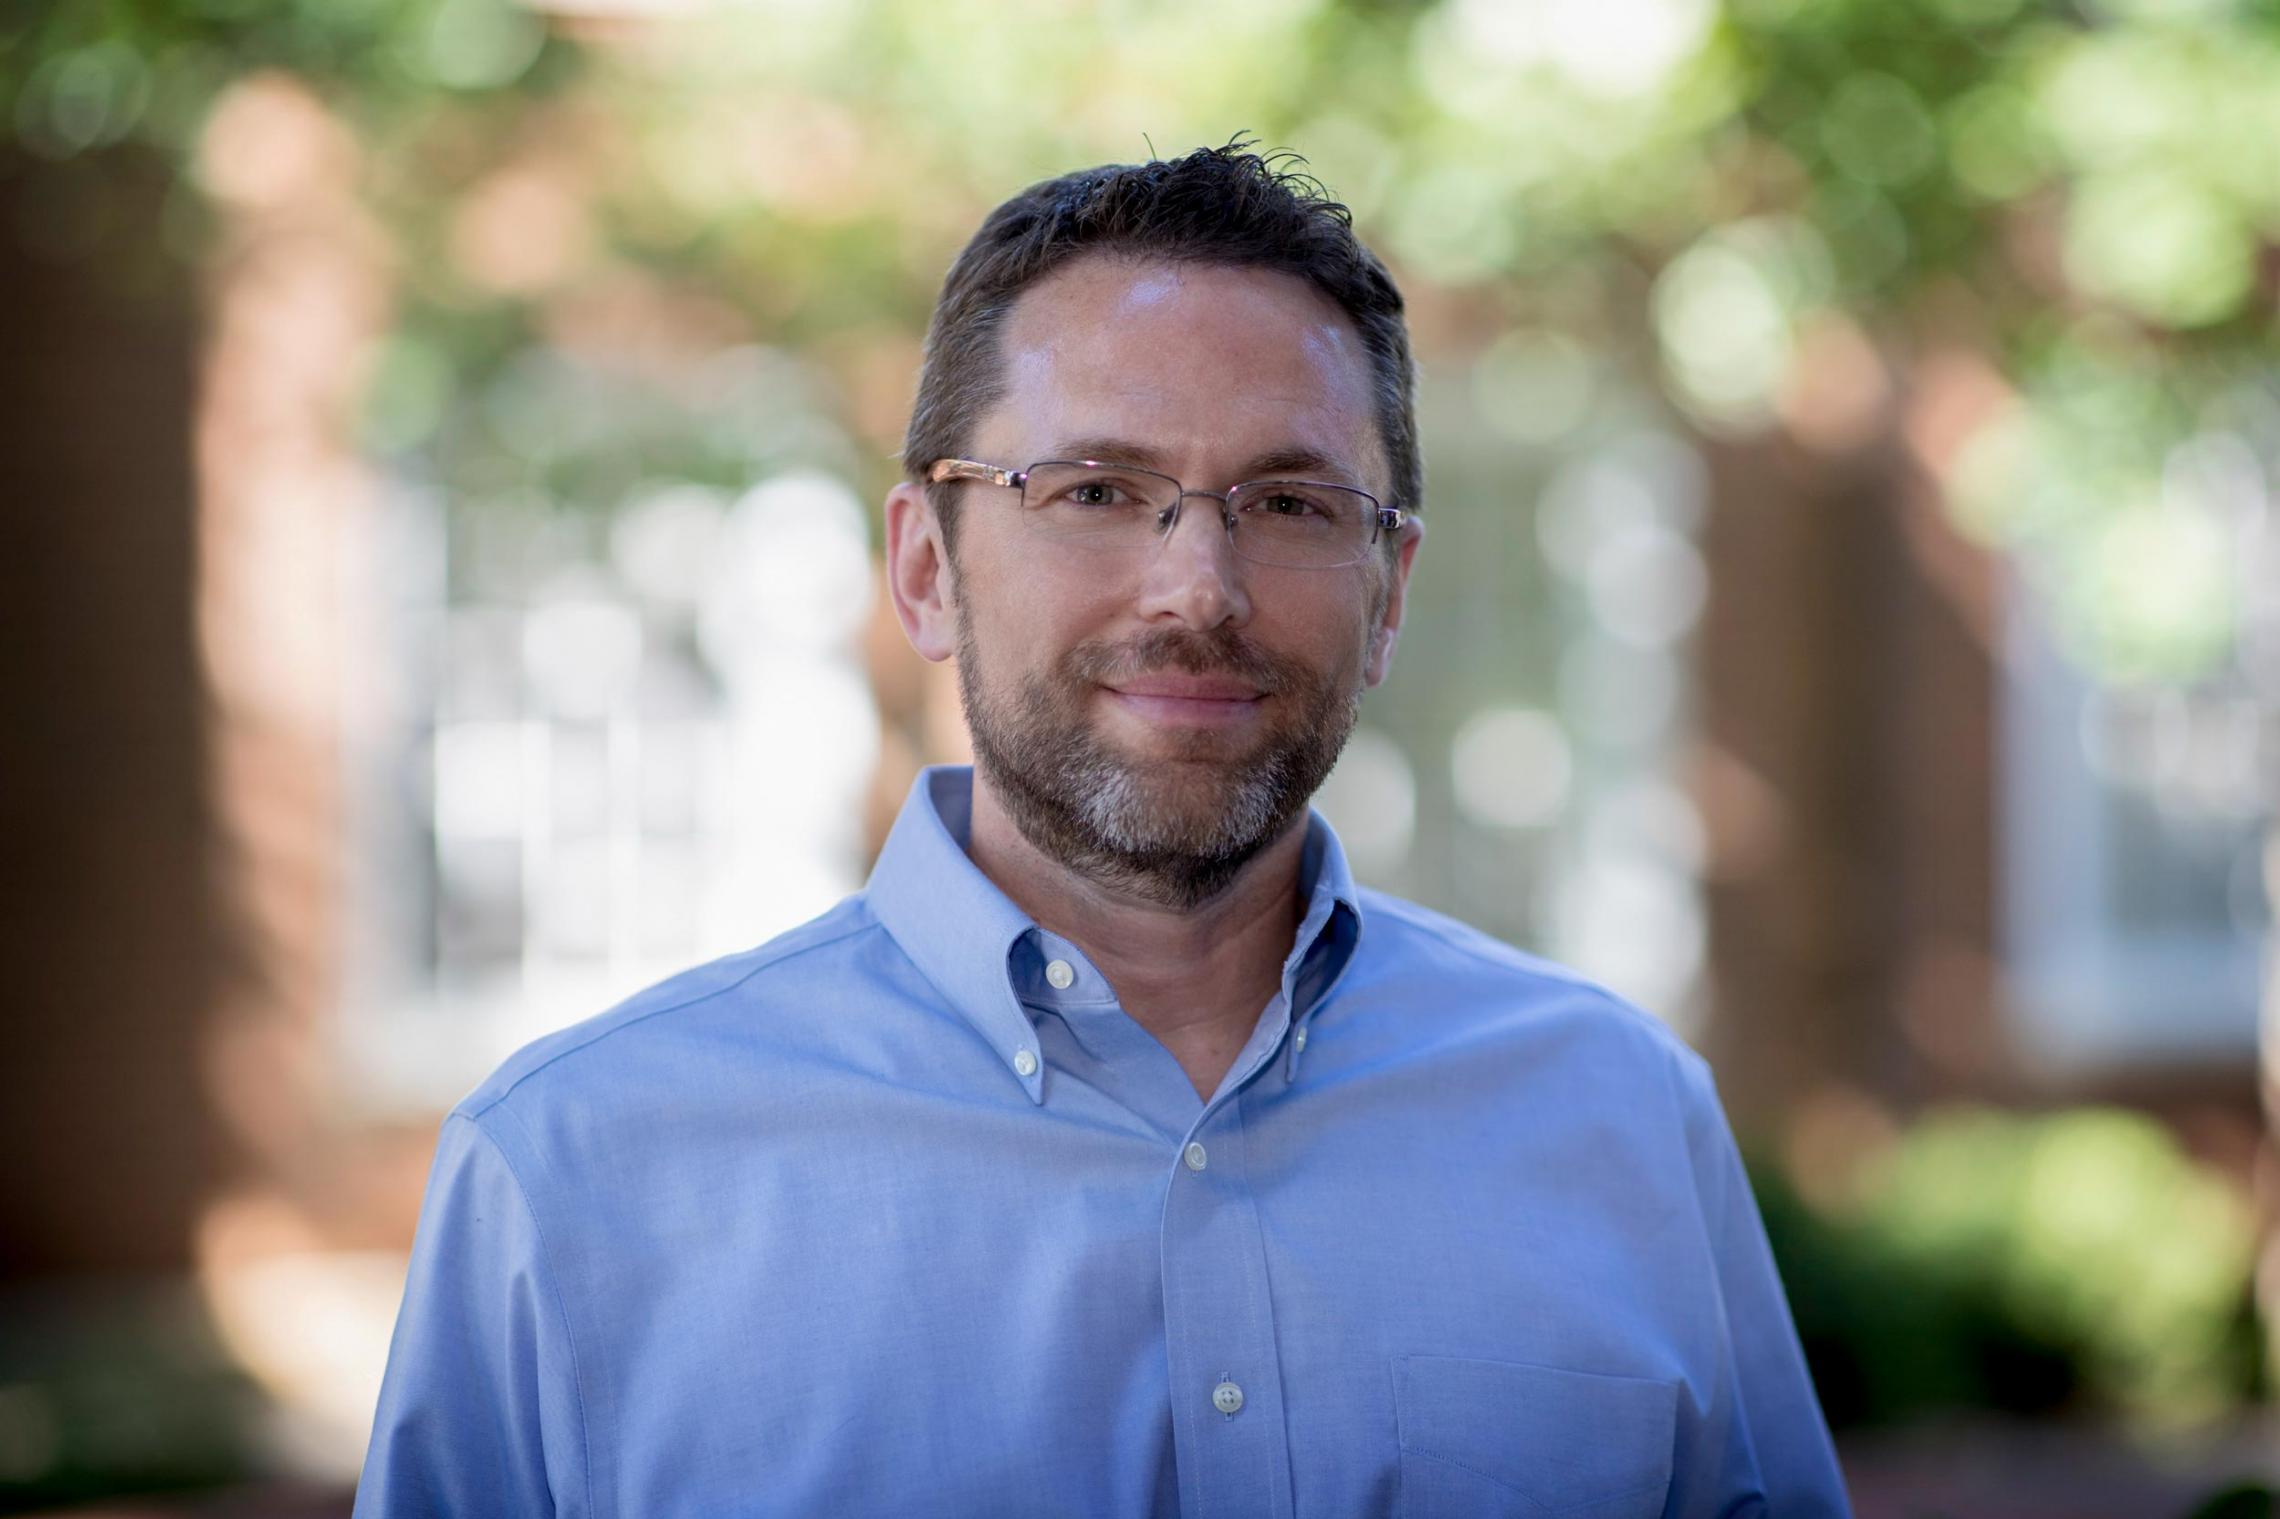 "UVA engineering professor John Lach, recently named dean of George Washington University's School of Engineering & Applied Science, is a ""rising star,"" UVA President Jim Ryan said."